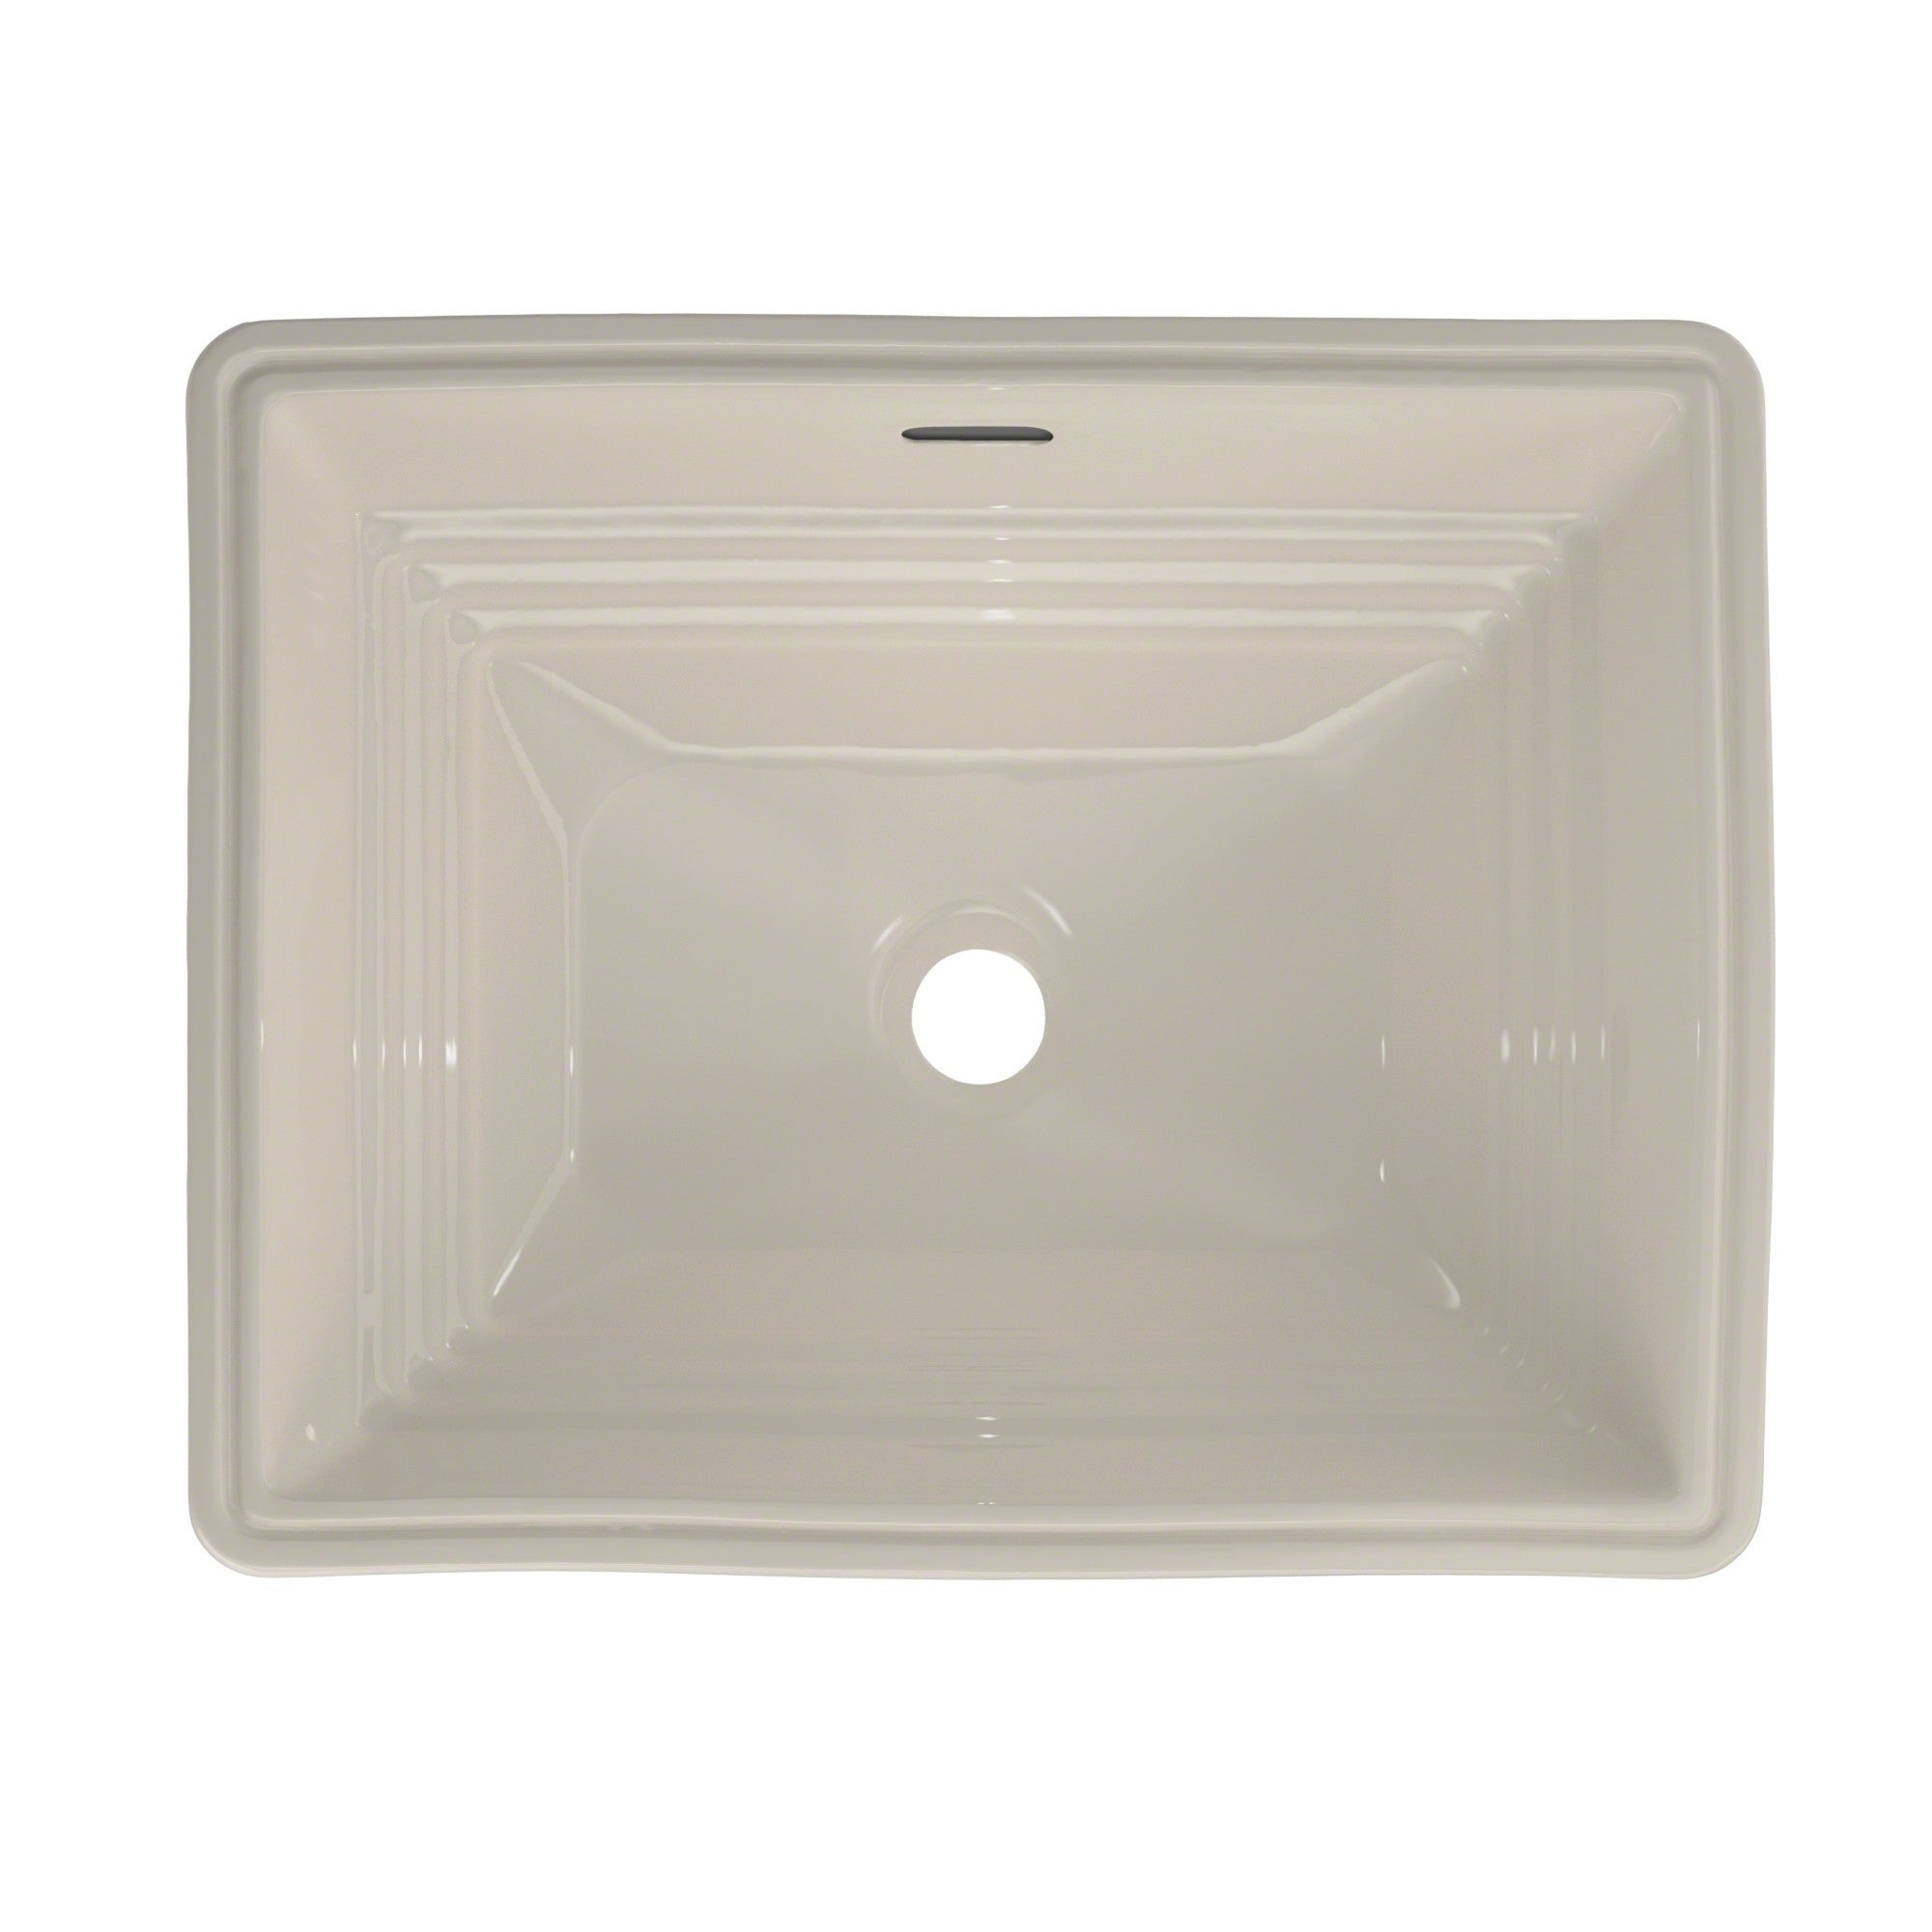 TOTO® Promenade® Rectangular Undermount Bathroom Sink, Sedona Beige ...